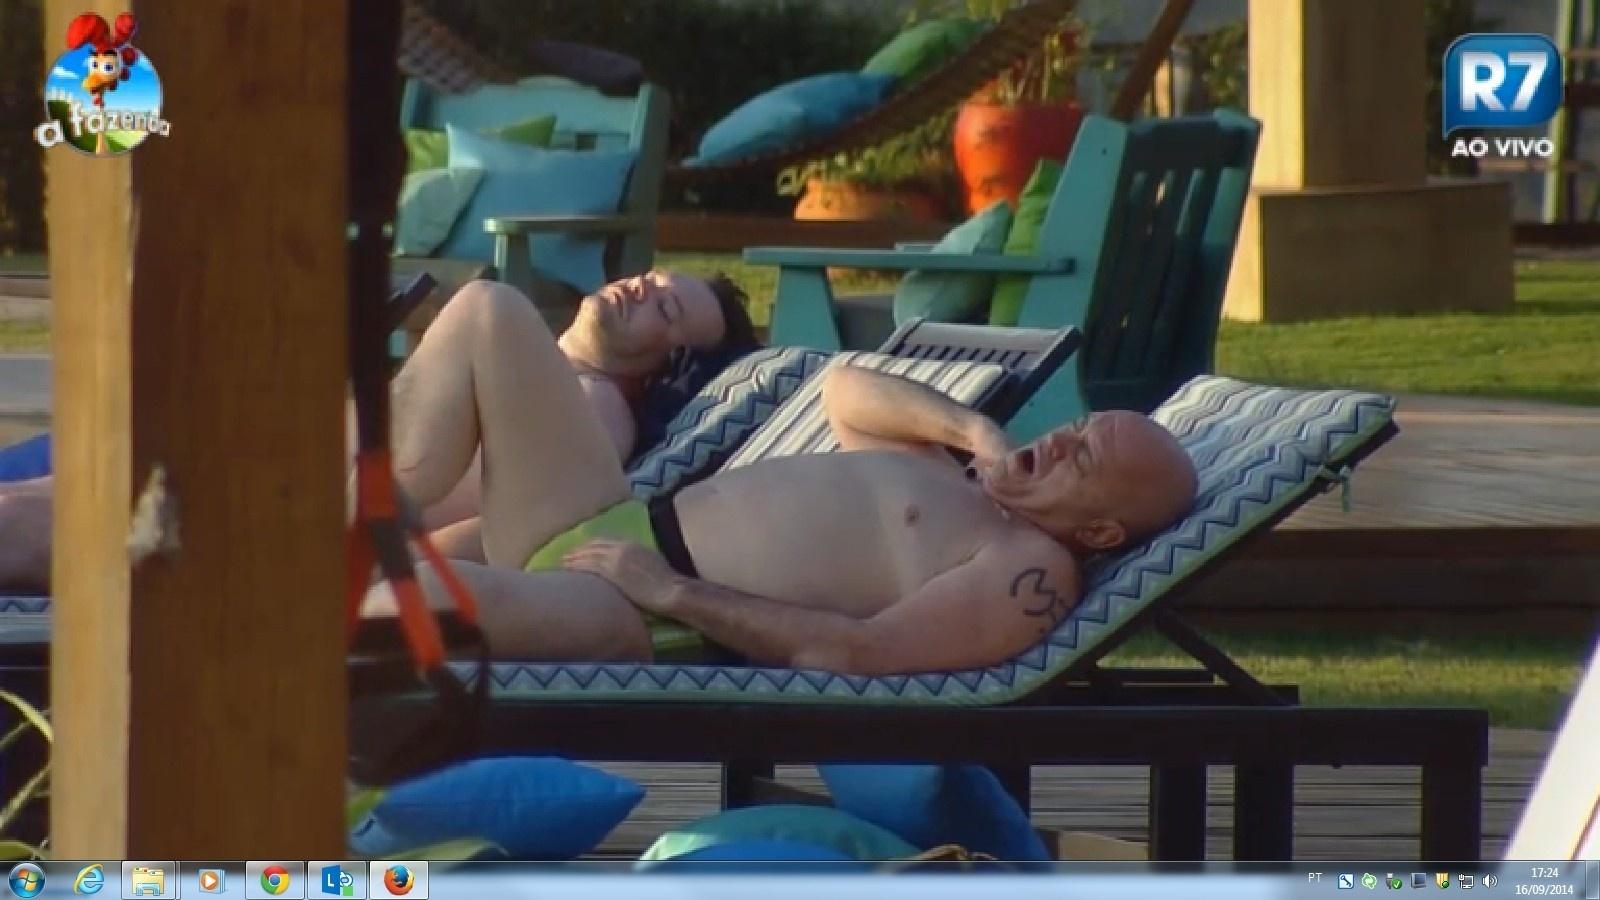 16-09-2014 Oscar Maroni tomando sol